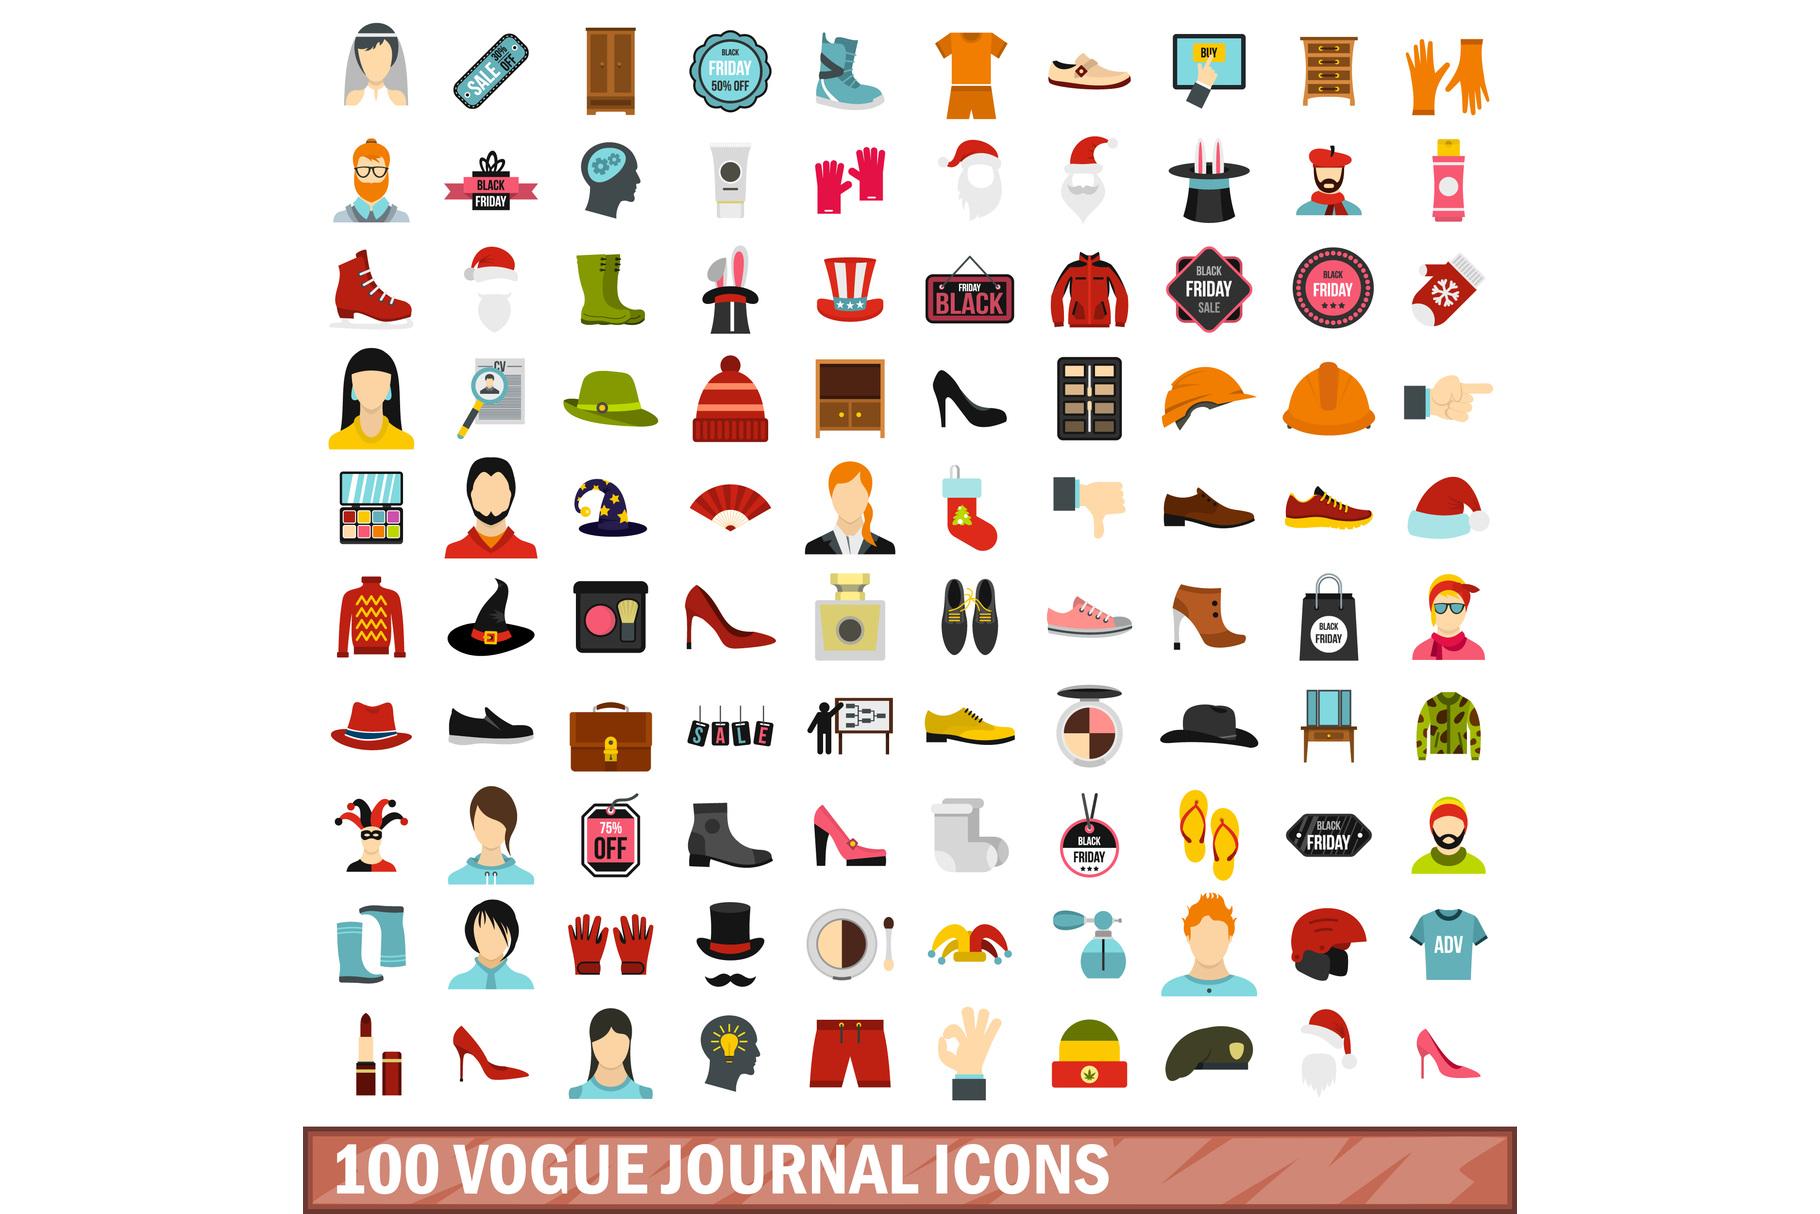 100 vogue journal icons set, flat style example image 1